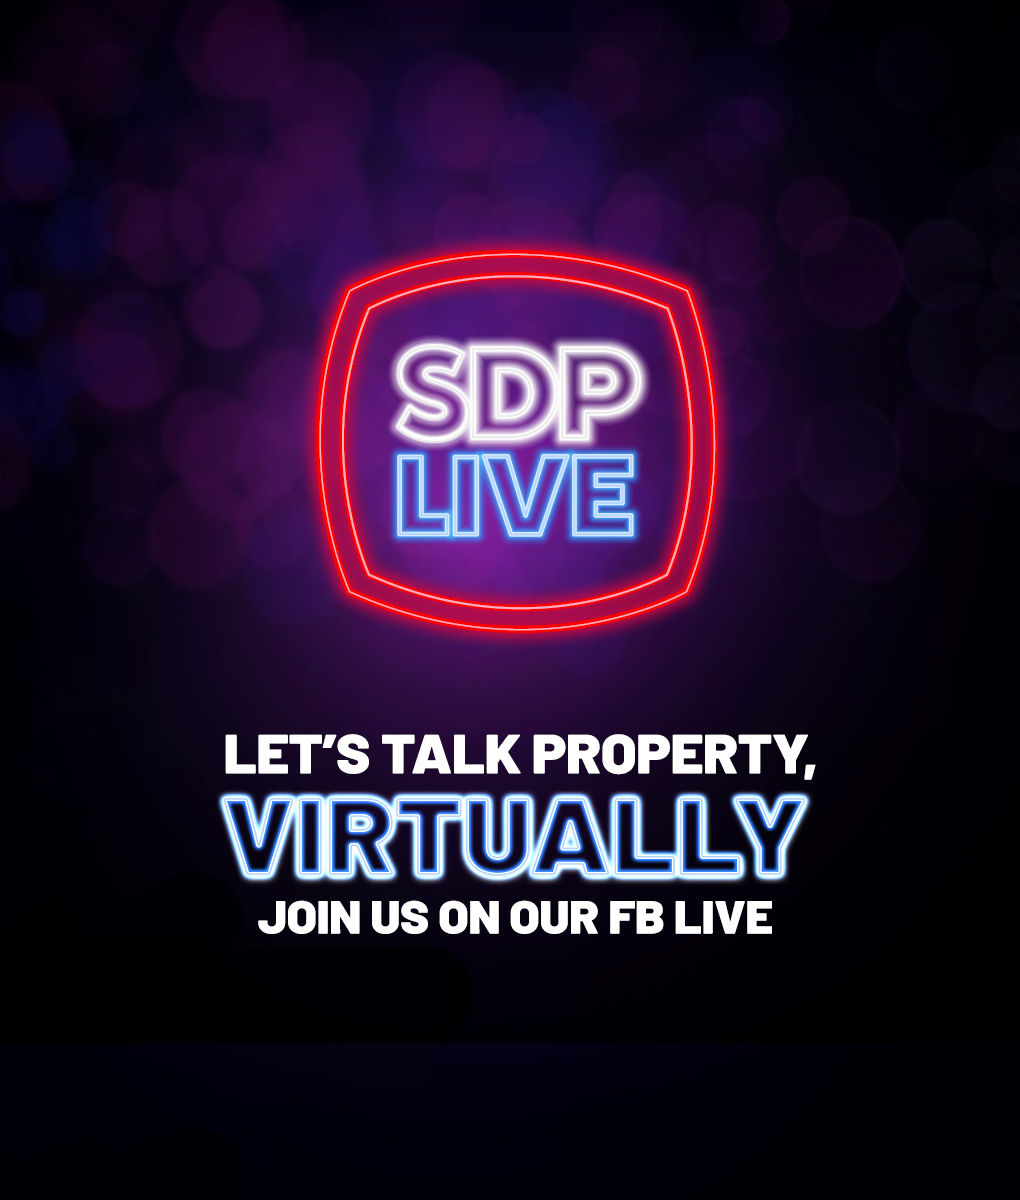 SDP Live - Let's Talk Property, Virtually